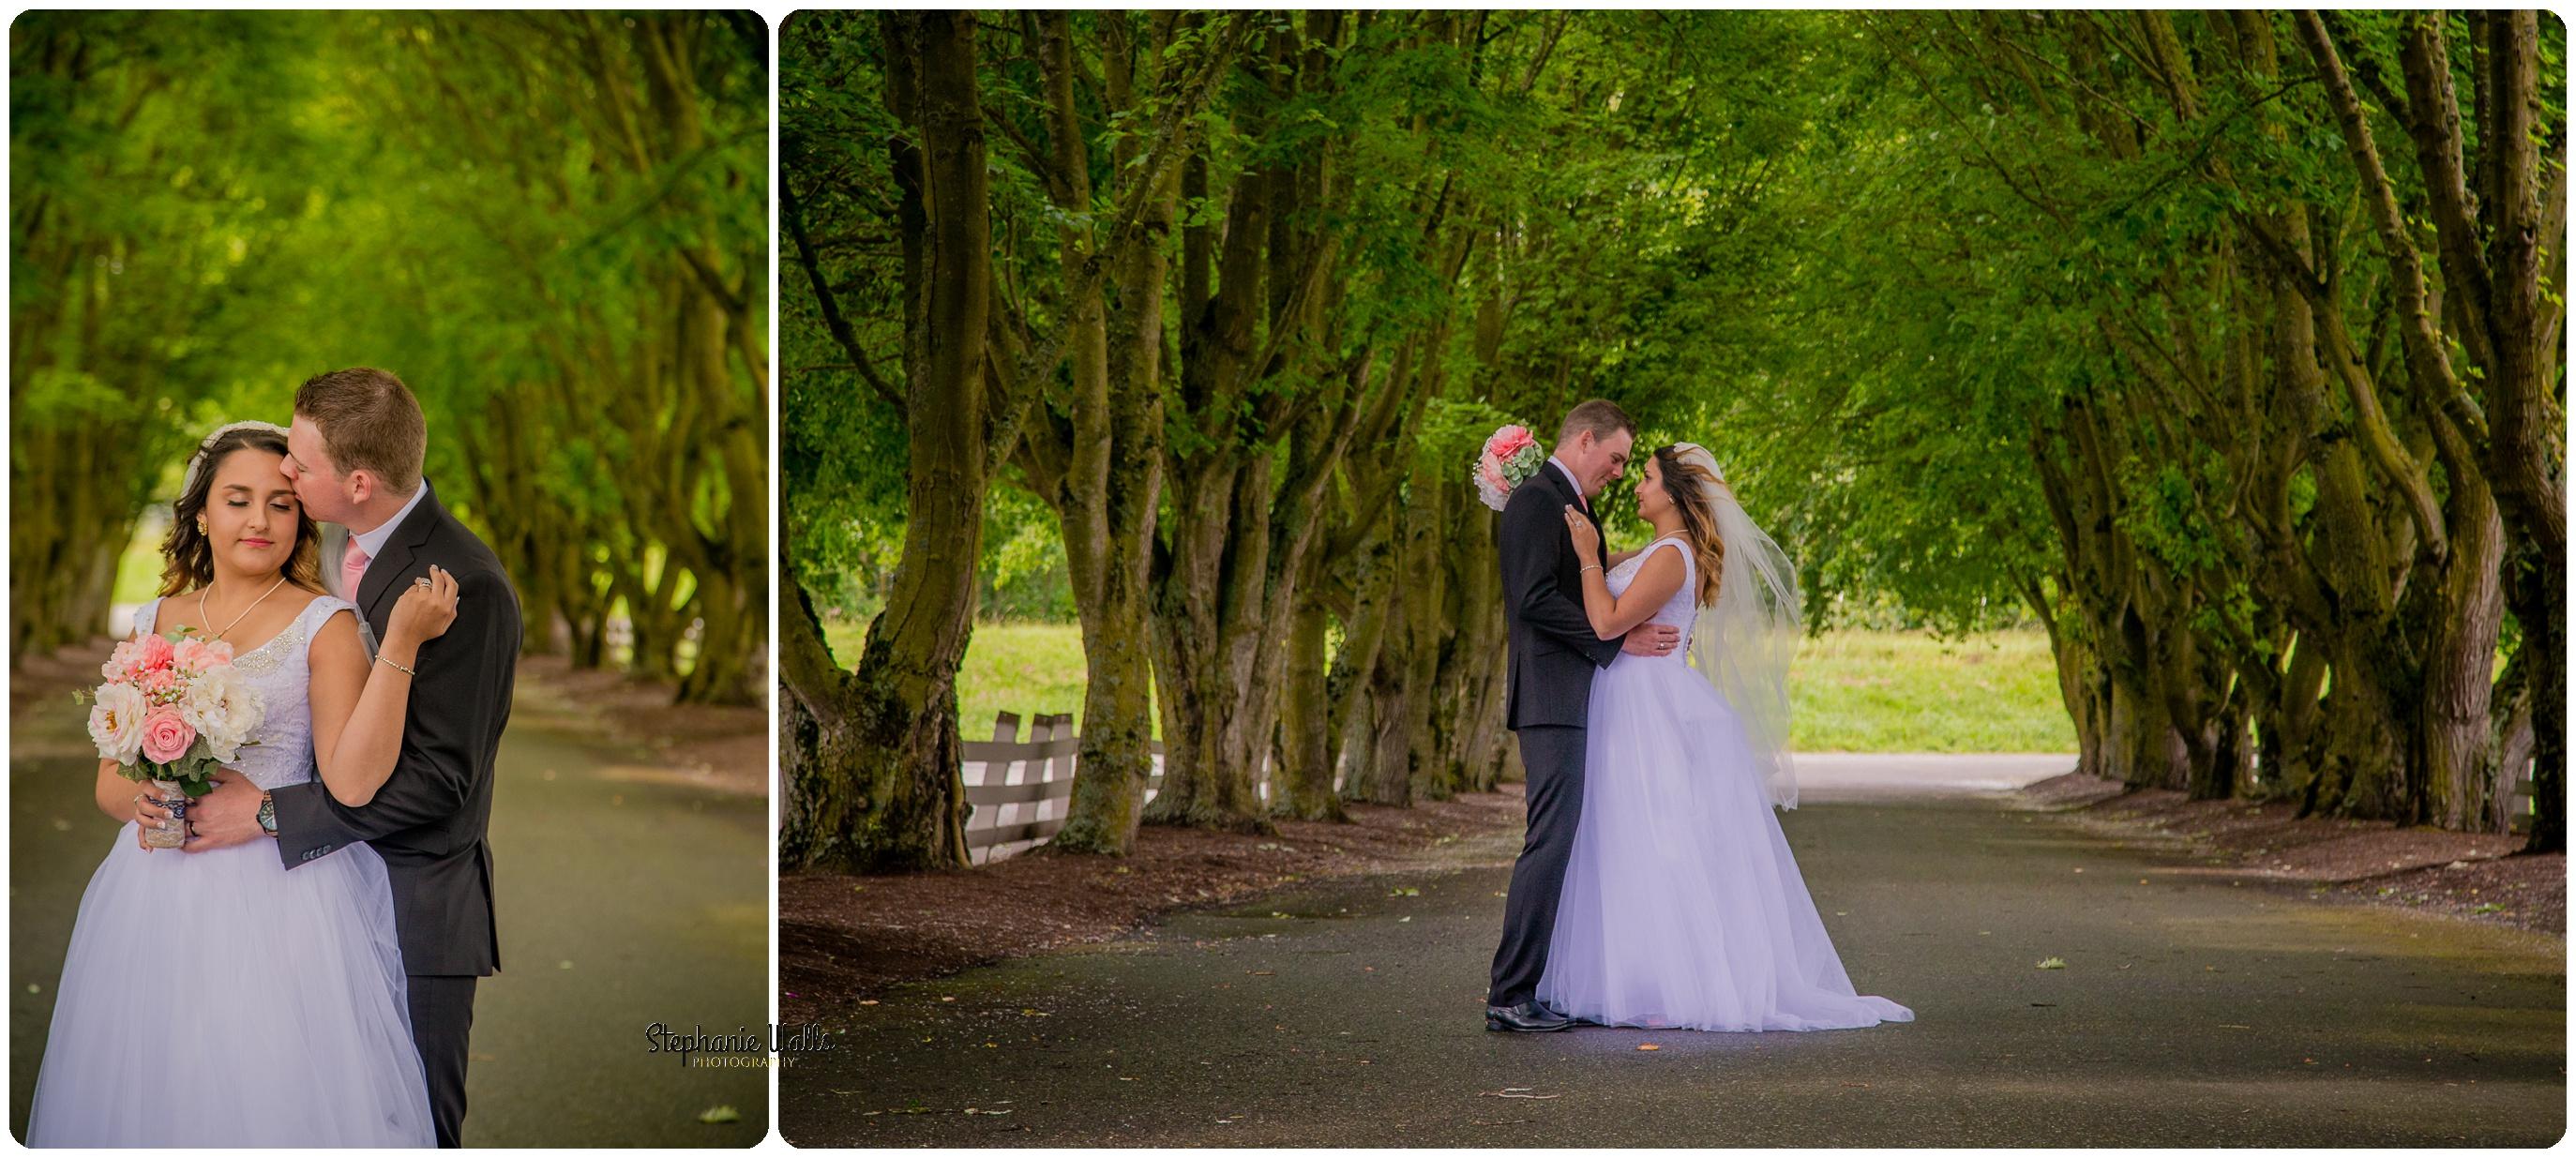 Miller Wedding313 WHERE EVER YOU GO | MAPLEHURST FARMS GUESTHOUSE | STEPHANIE WALLS PHOTOGRAPHY